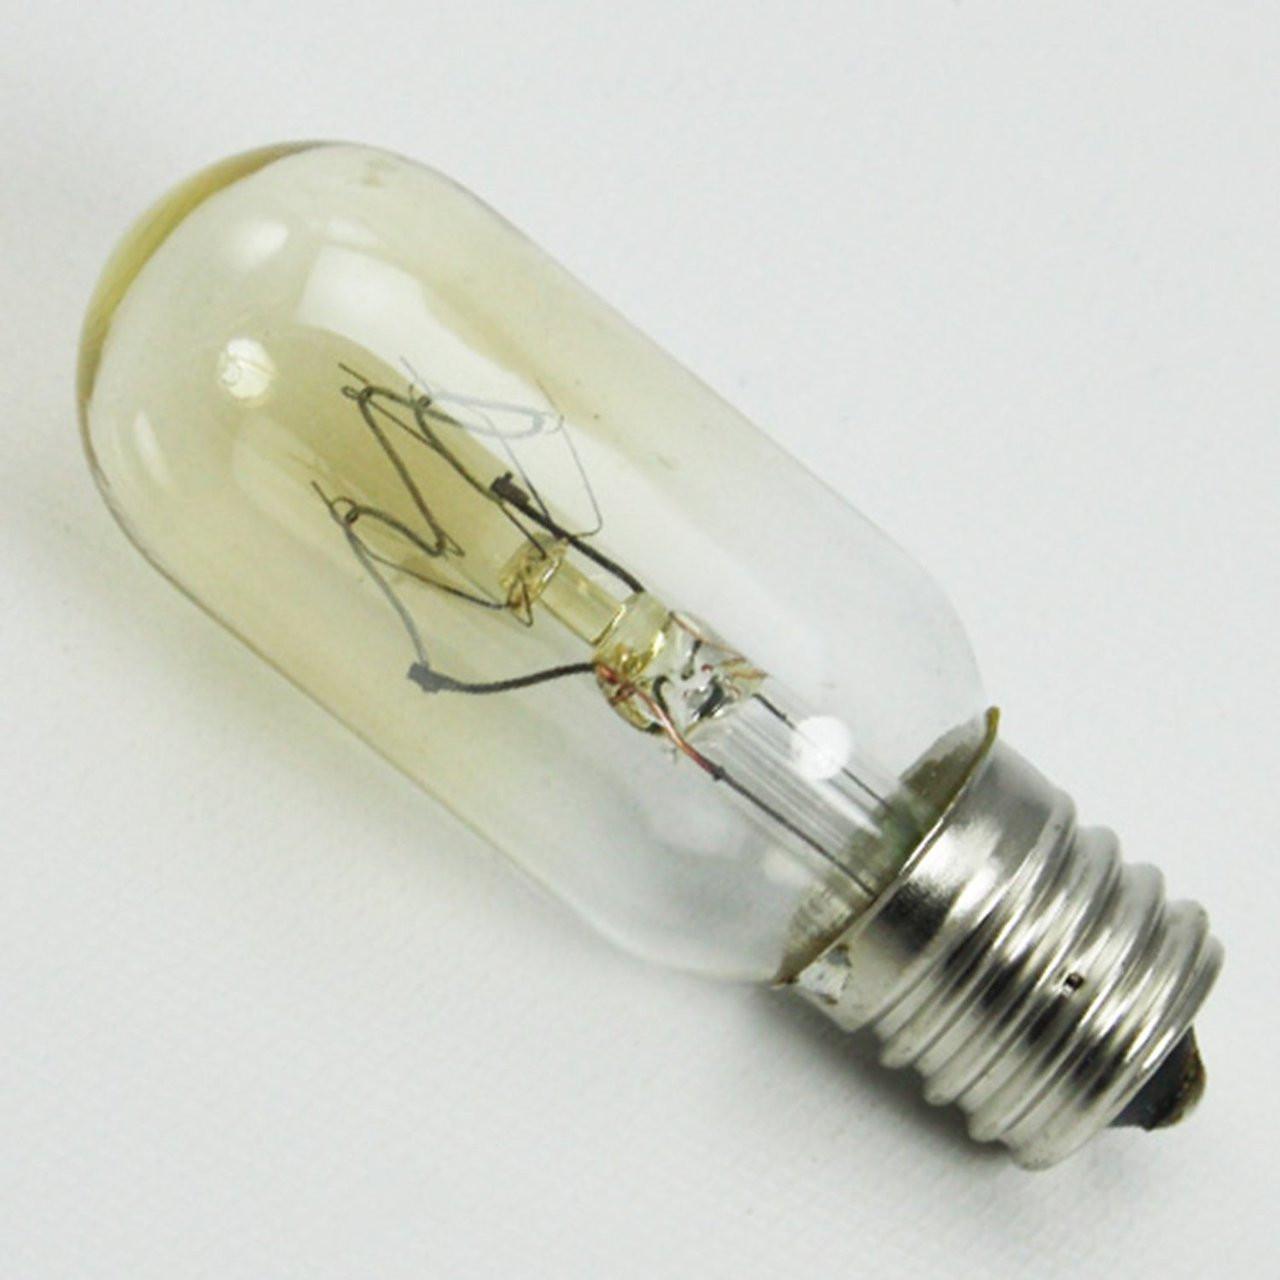 microwave light bulb 40 watt t8 for whirlpool r0713676